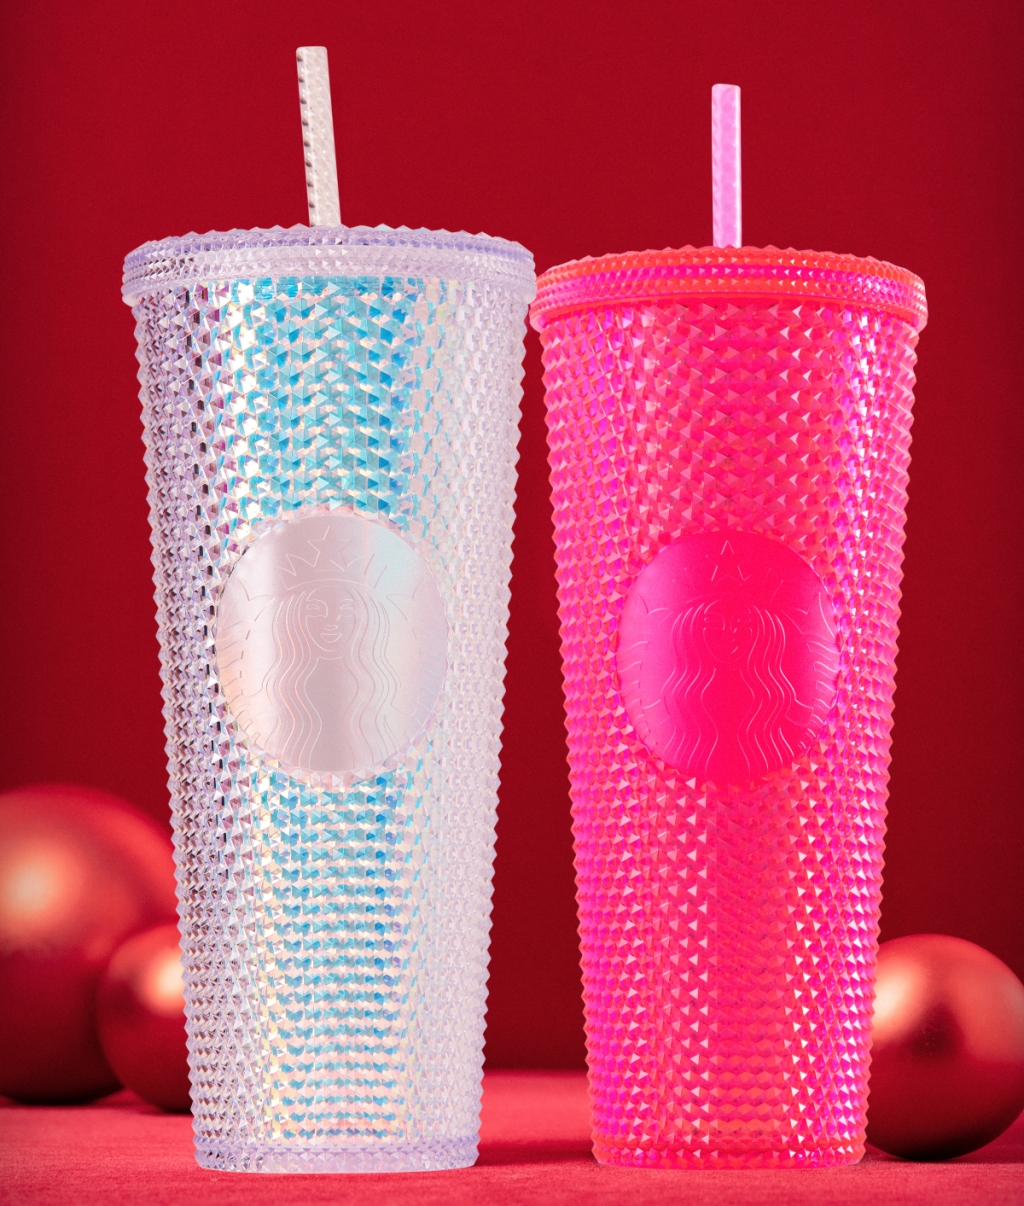 2 Starbucks Iridescent cold cups